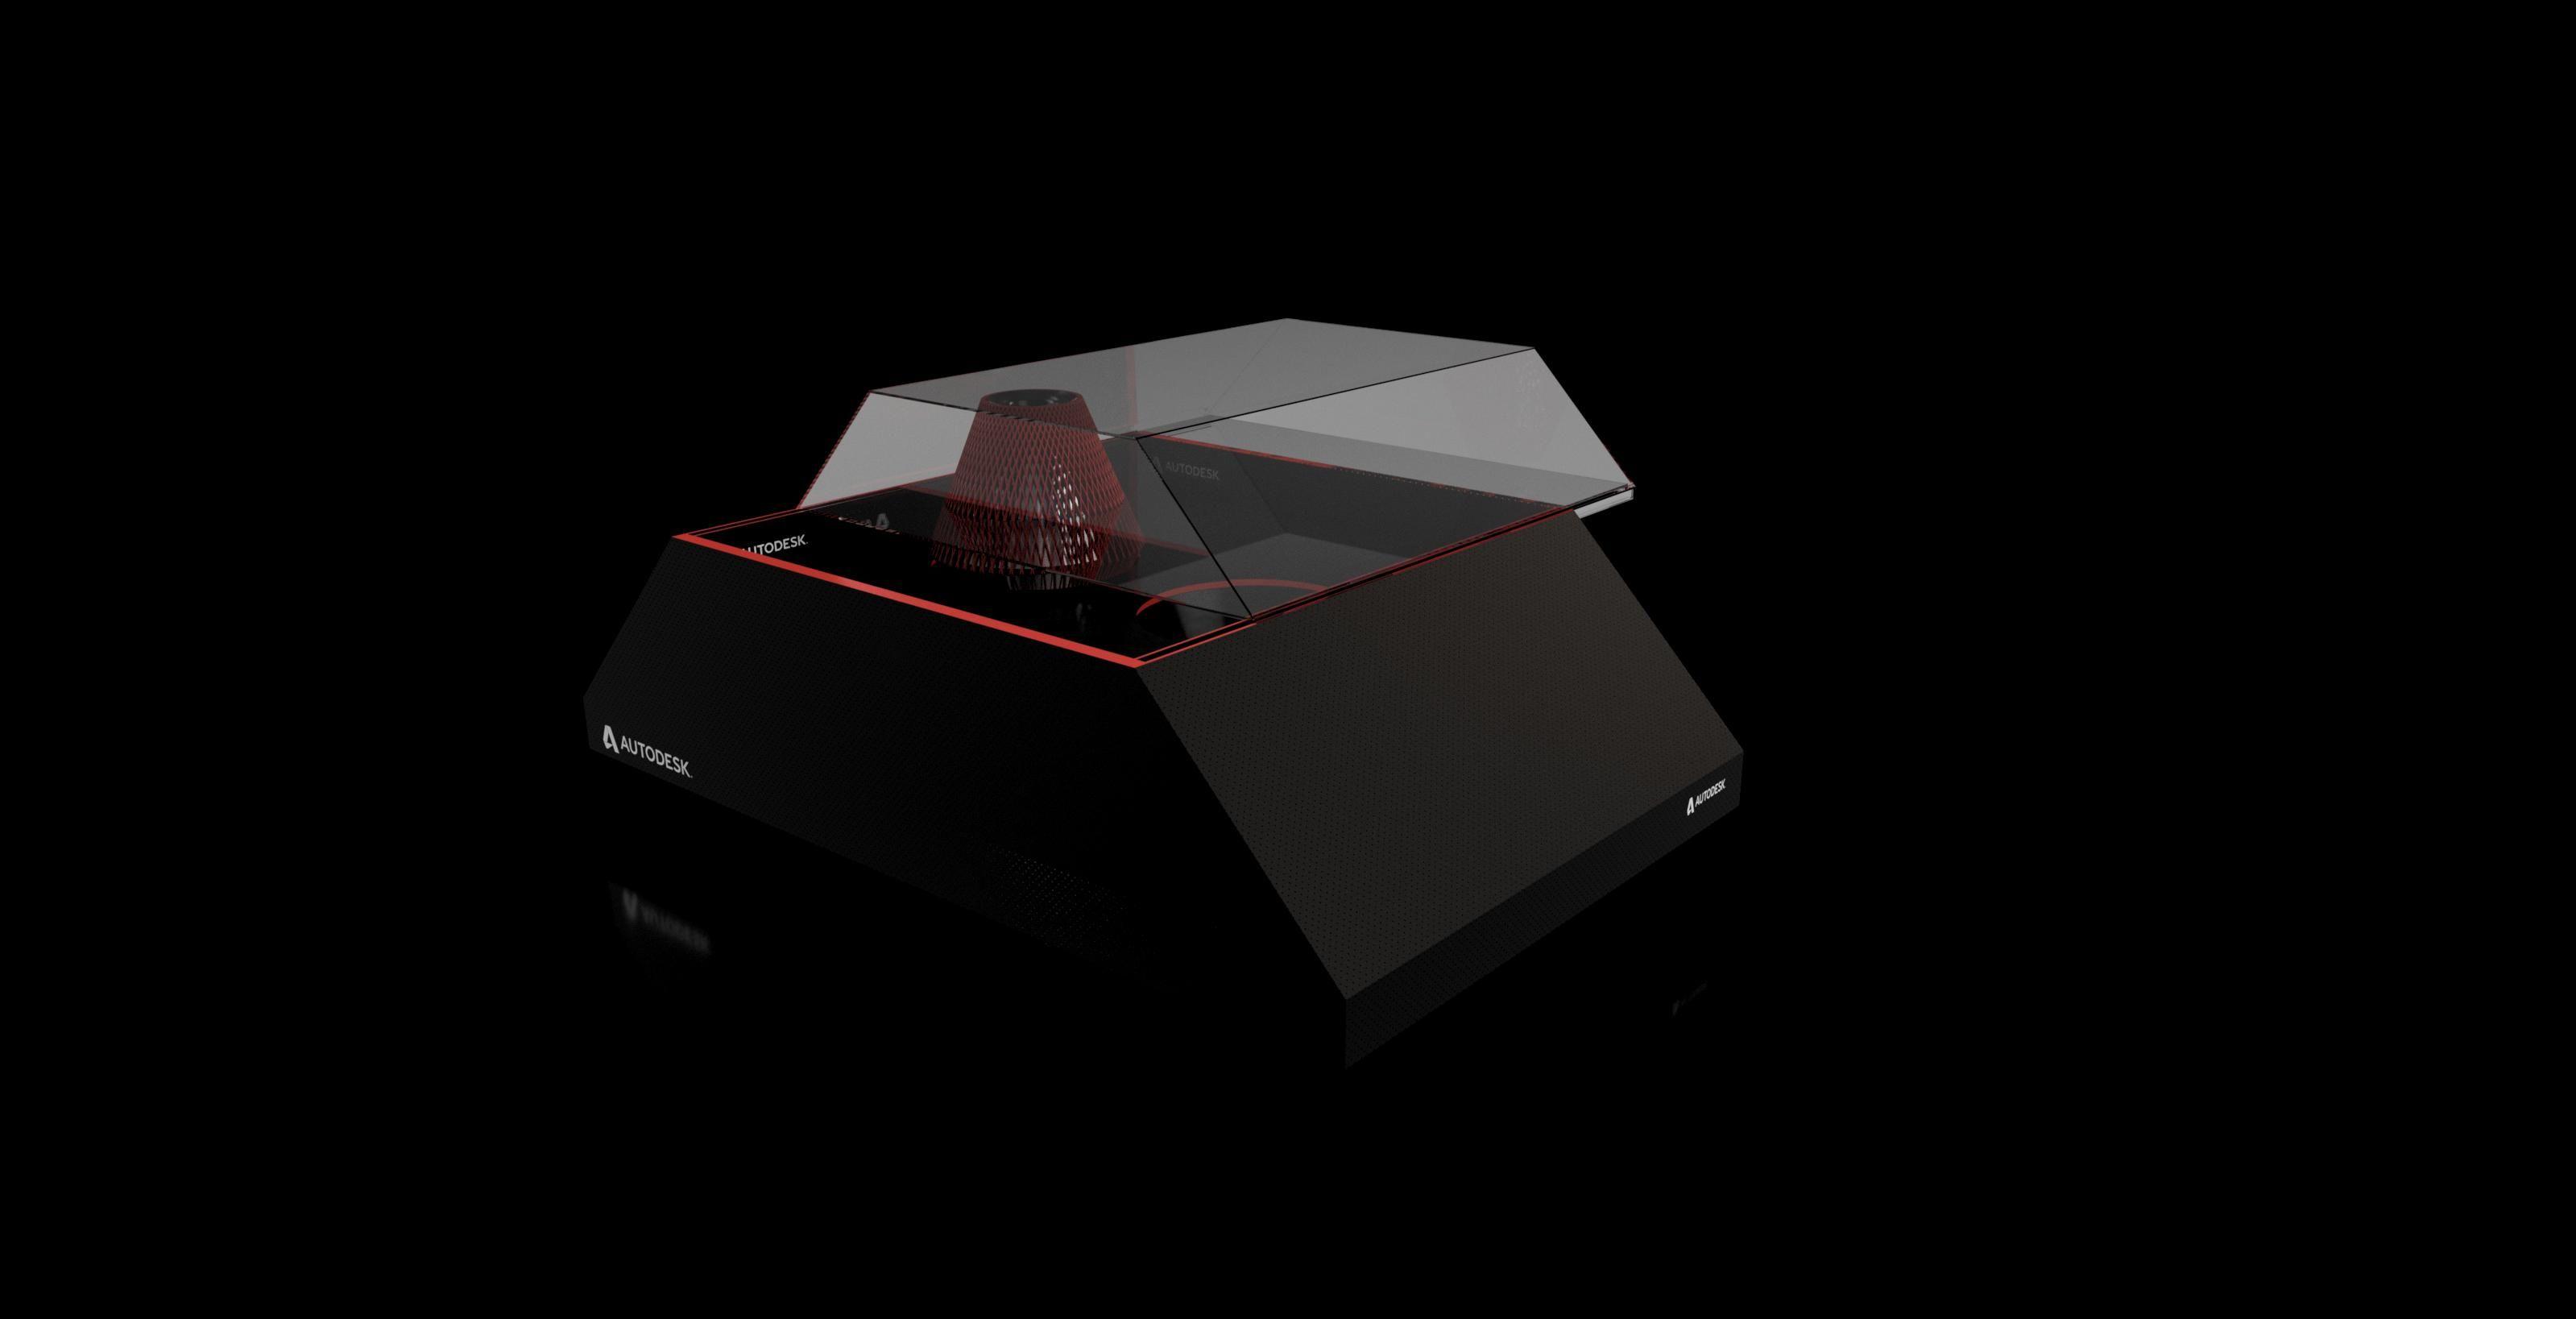 Earbud-completlynewone-01-v49-003jpeg-3500-3500